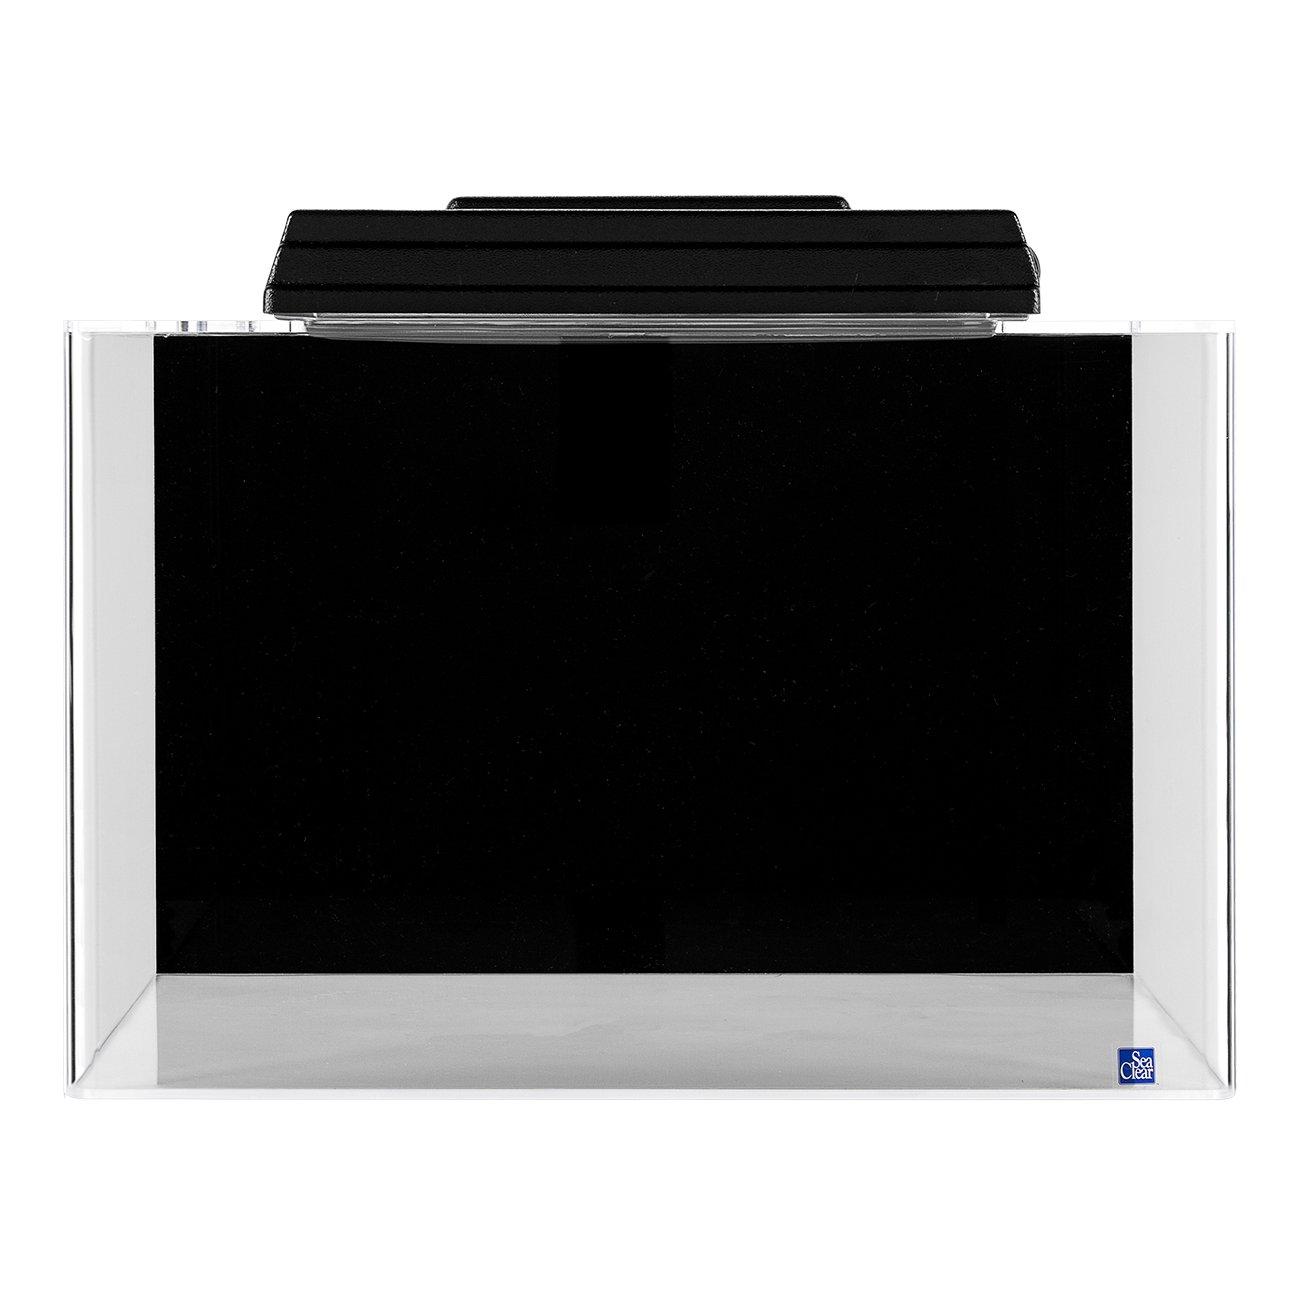 Seaclear rectangular 20 gallon aquarium combos in black for Sea clear fish tank